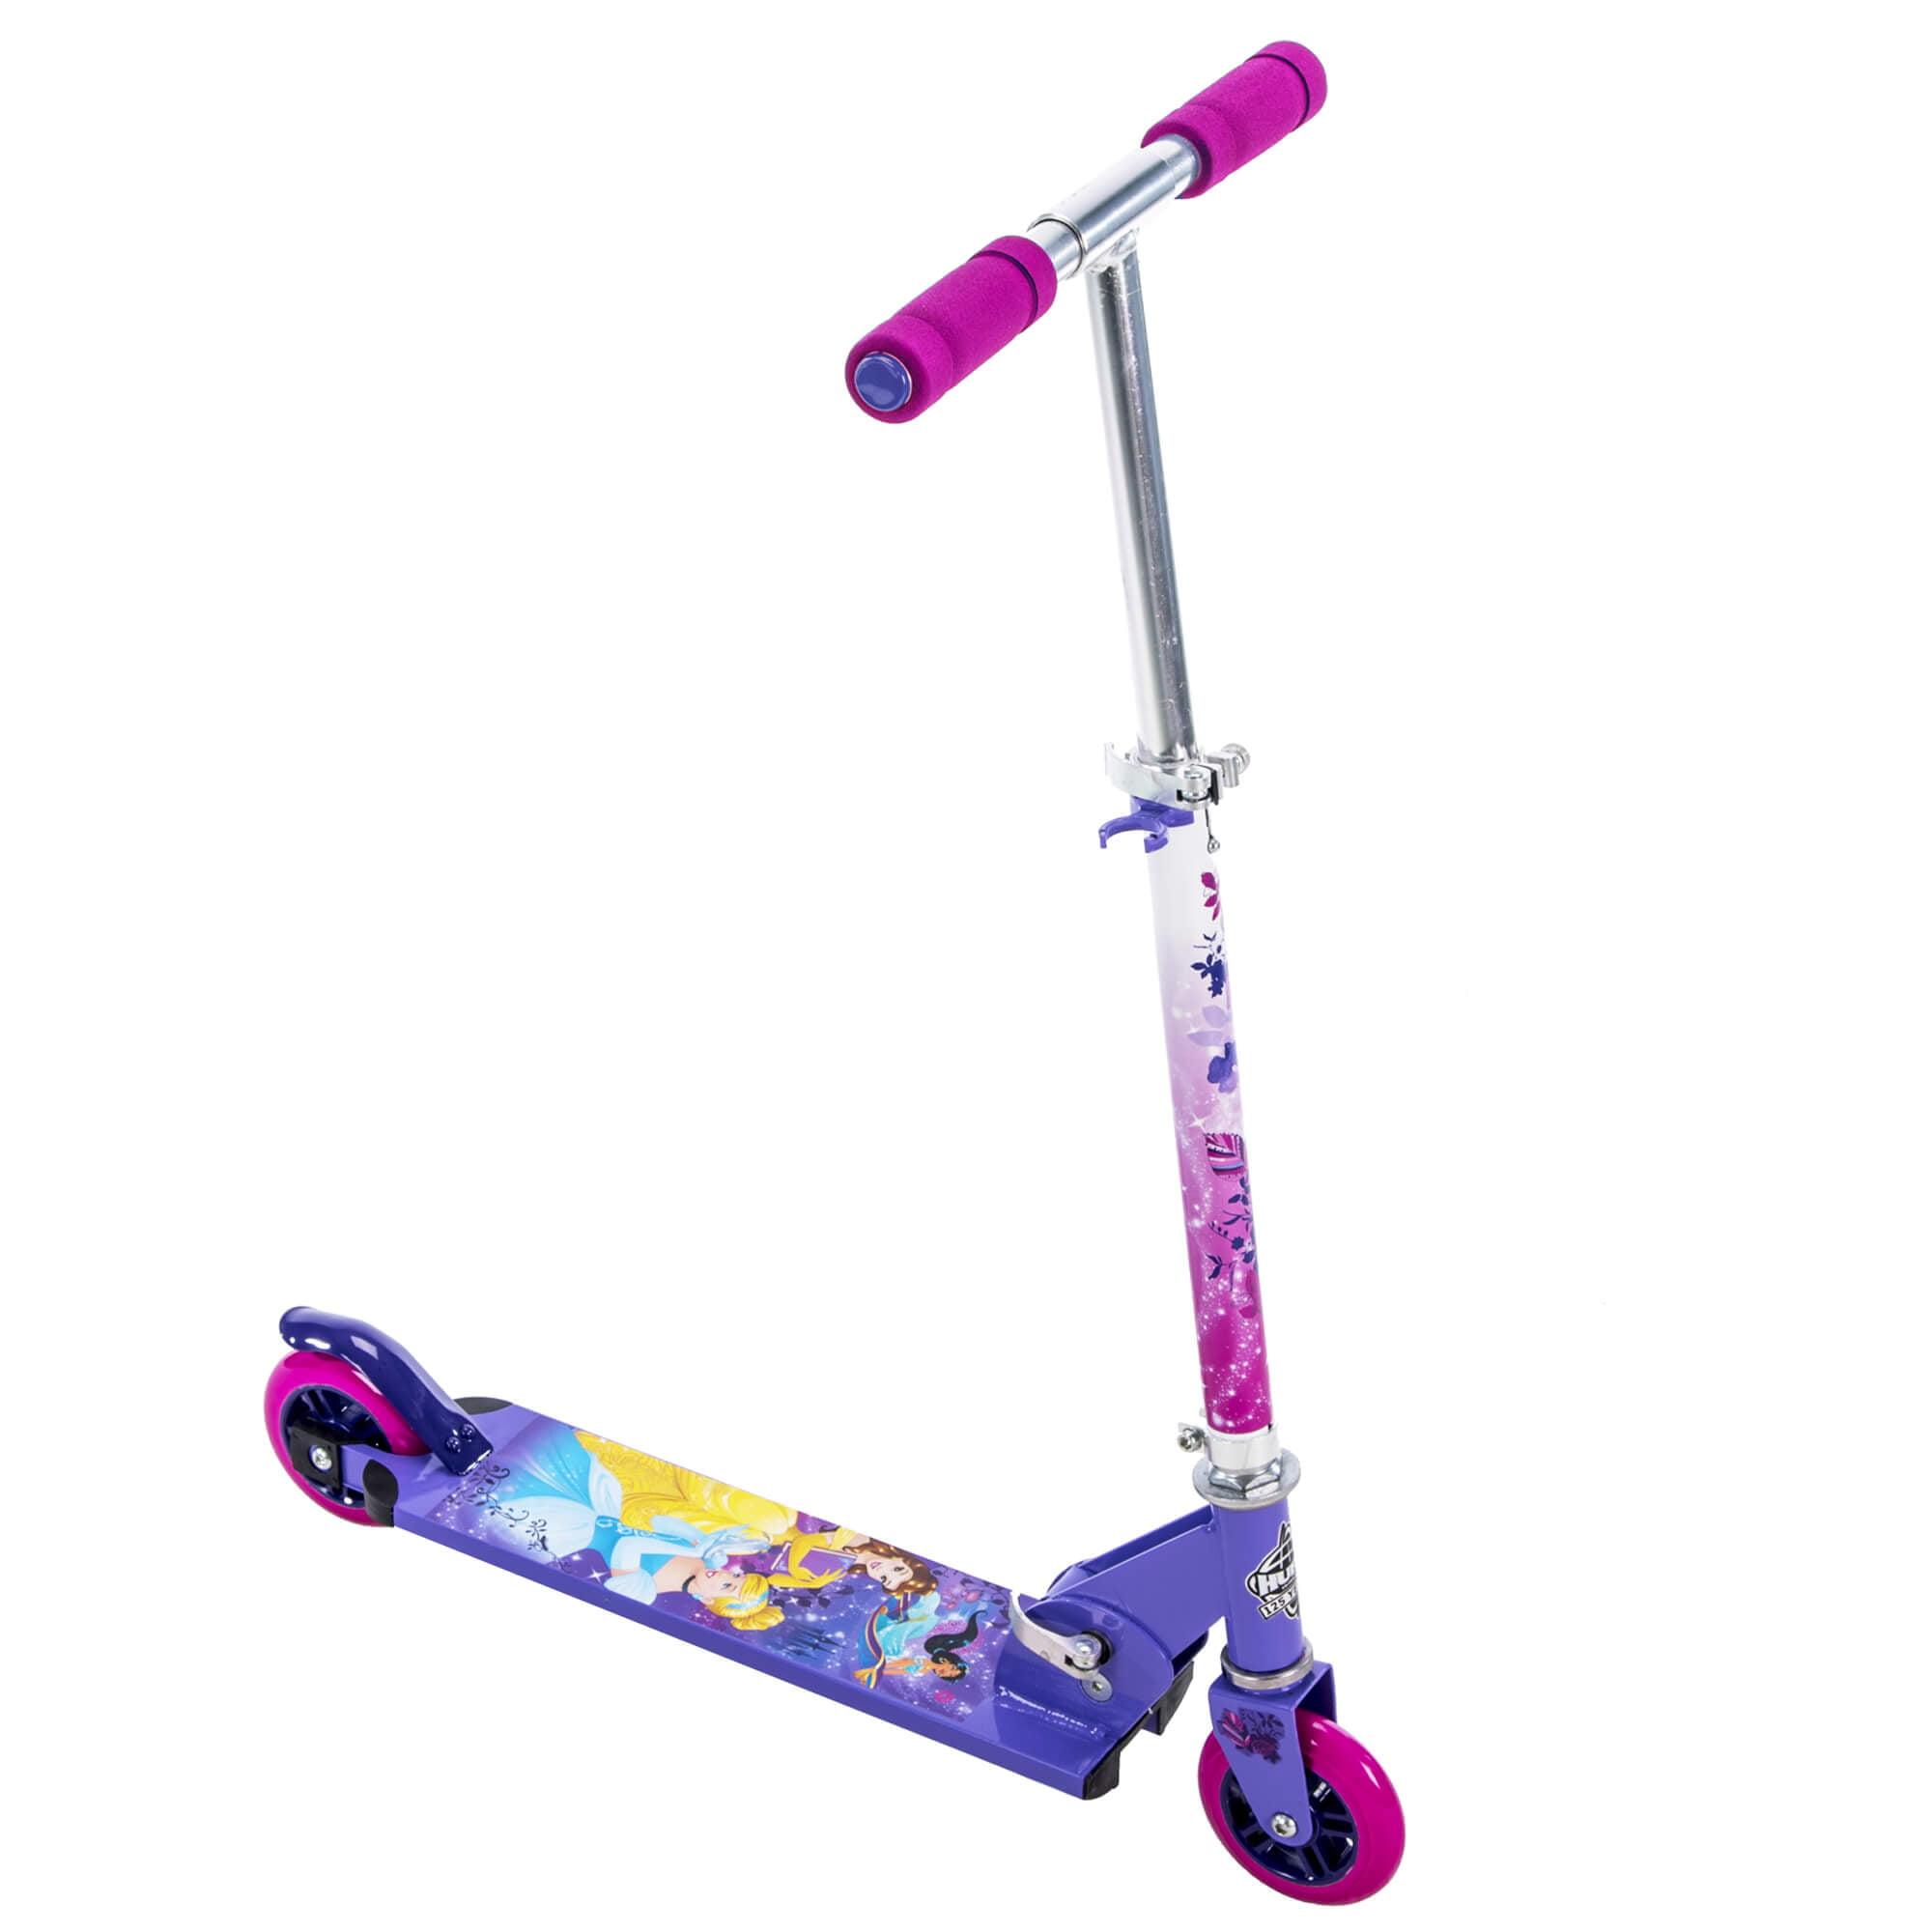 Disney Princess Girls' 2-Wheel Inline Folding Scooter by Huffy by Huffy